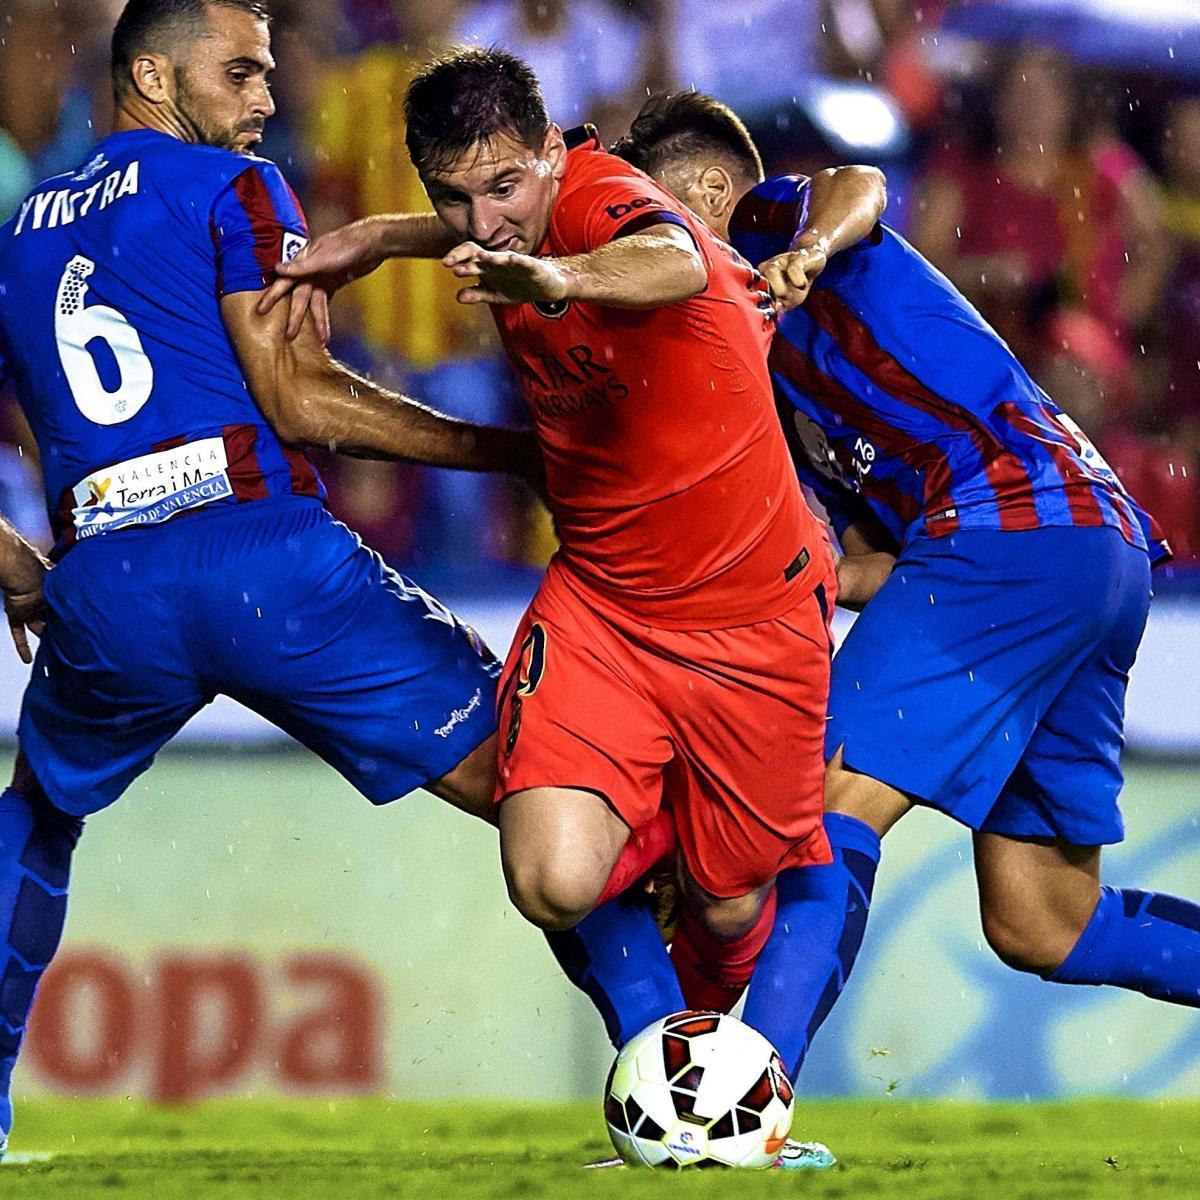 Arsenal Vs Barcelona Live Score Highlights From: Barcelona Vs. Levante: Live Score, Highlights For La Liga